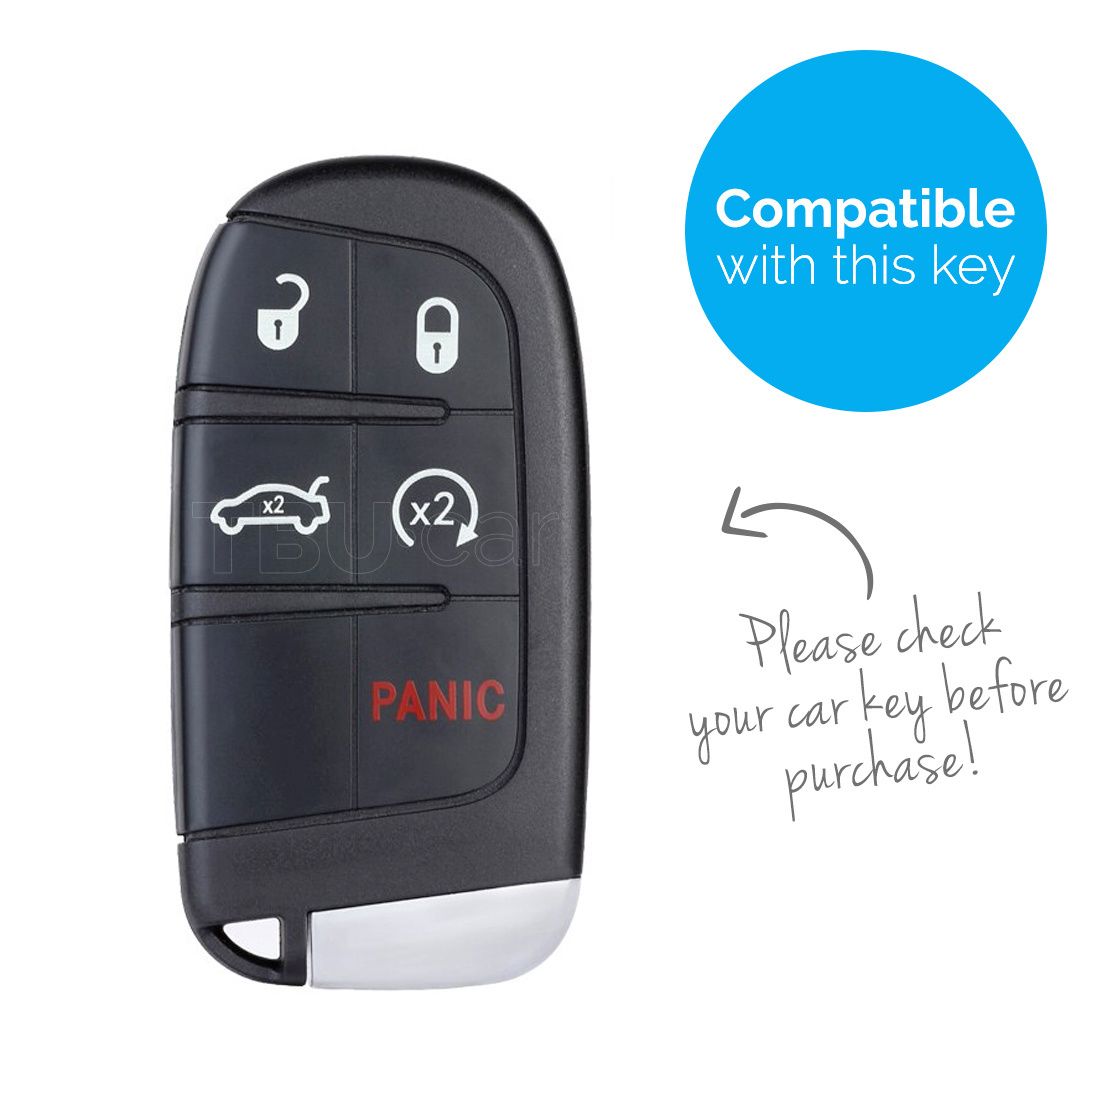 TBU car Autoschlüssel Hülle für Fiat 5 Tasten (Keyless Entry) - Schutzhülle aus Silikon - Auto Schlüsselhülle Cover in Rot